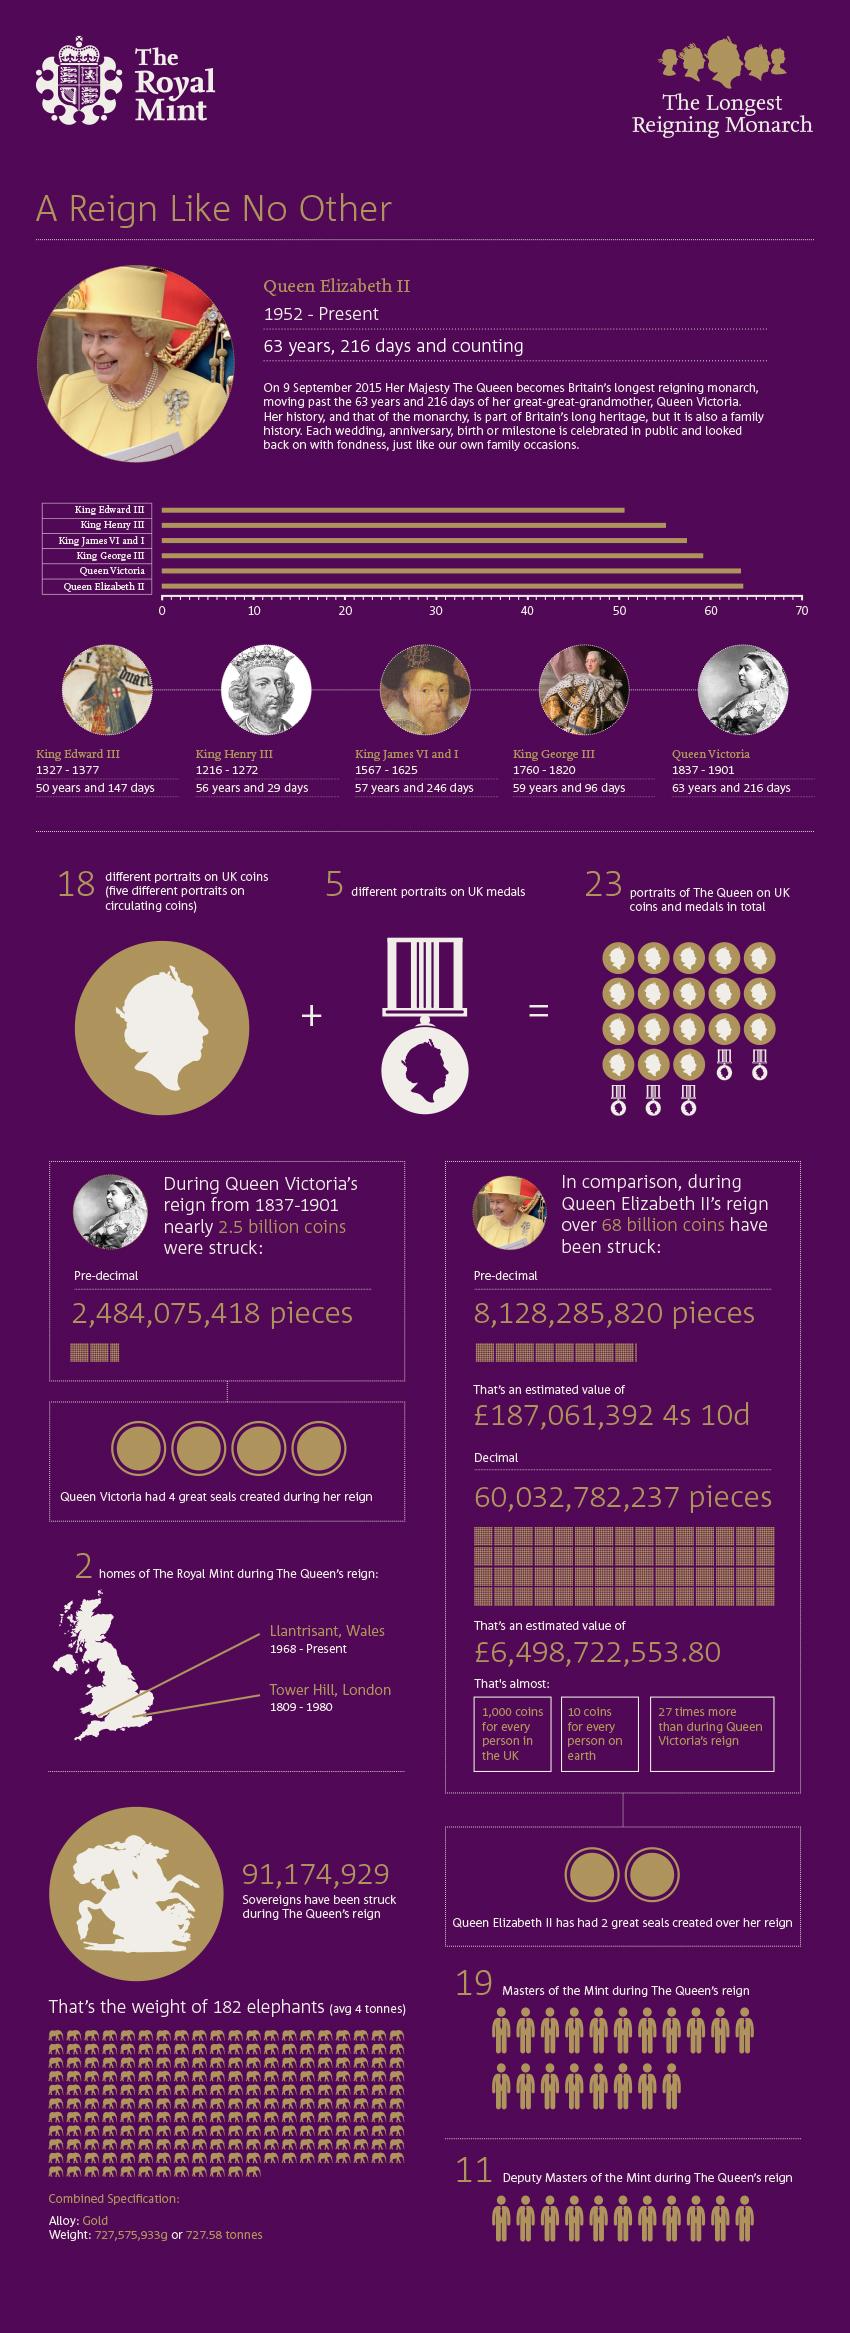 LRM_Online_Infographic_Stats